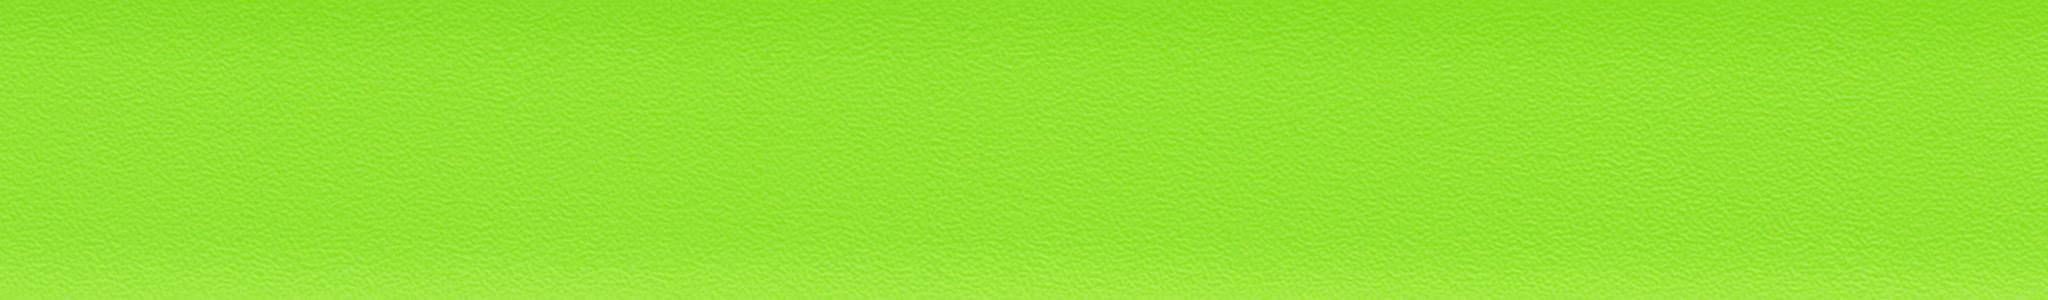 HU 167190 ABS hrana zelená perla 101